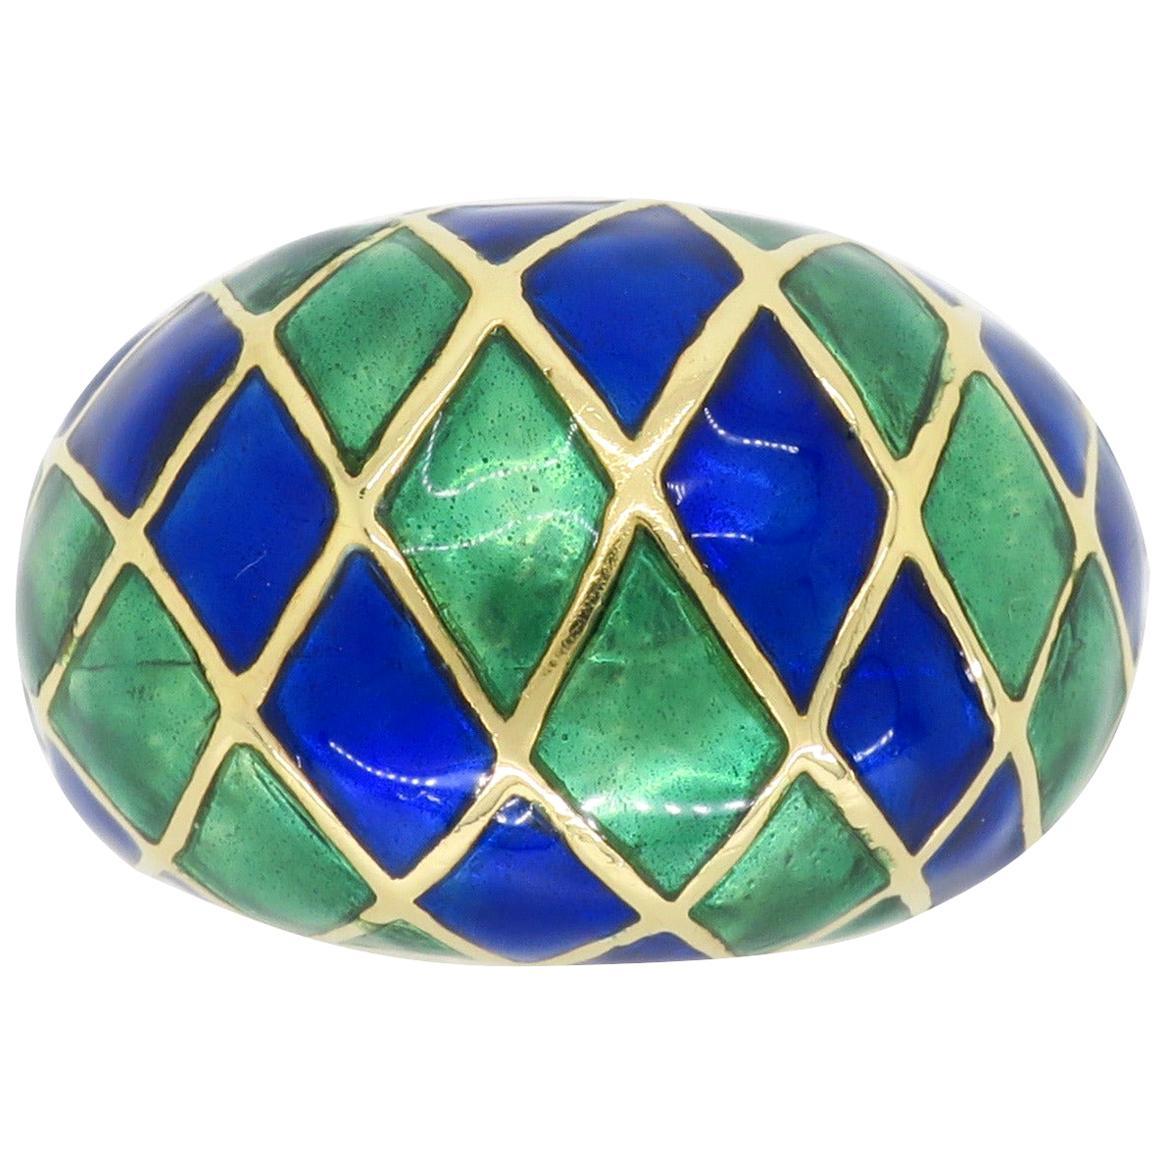 18 Karat Gold and Enamel Checkerboard Ring